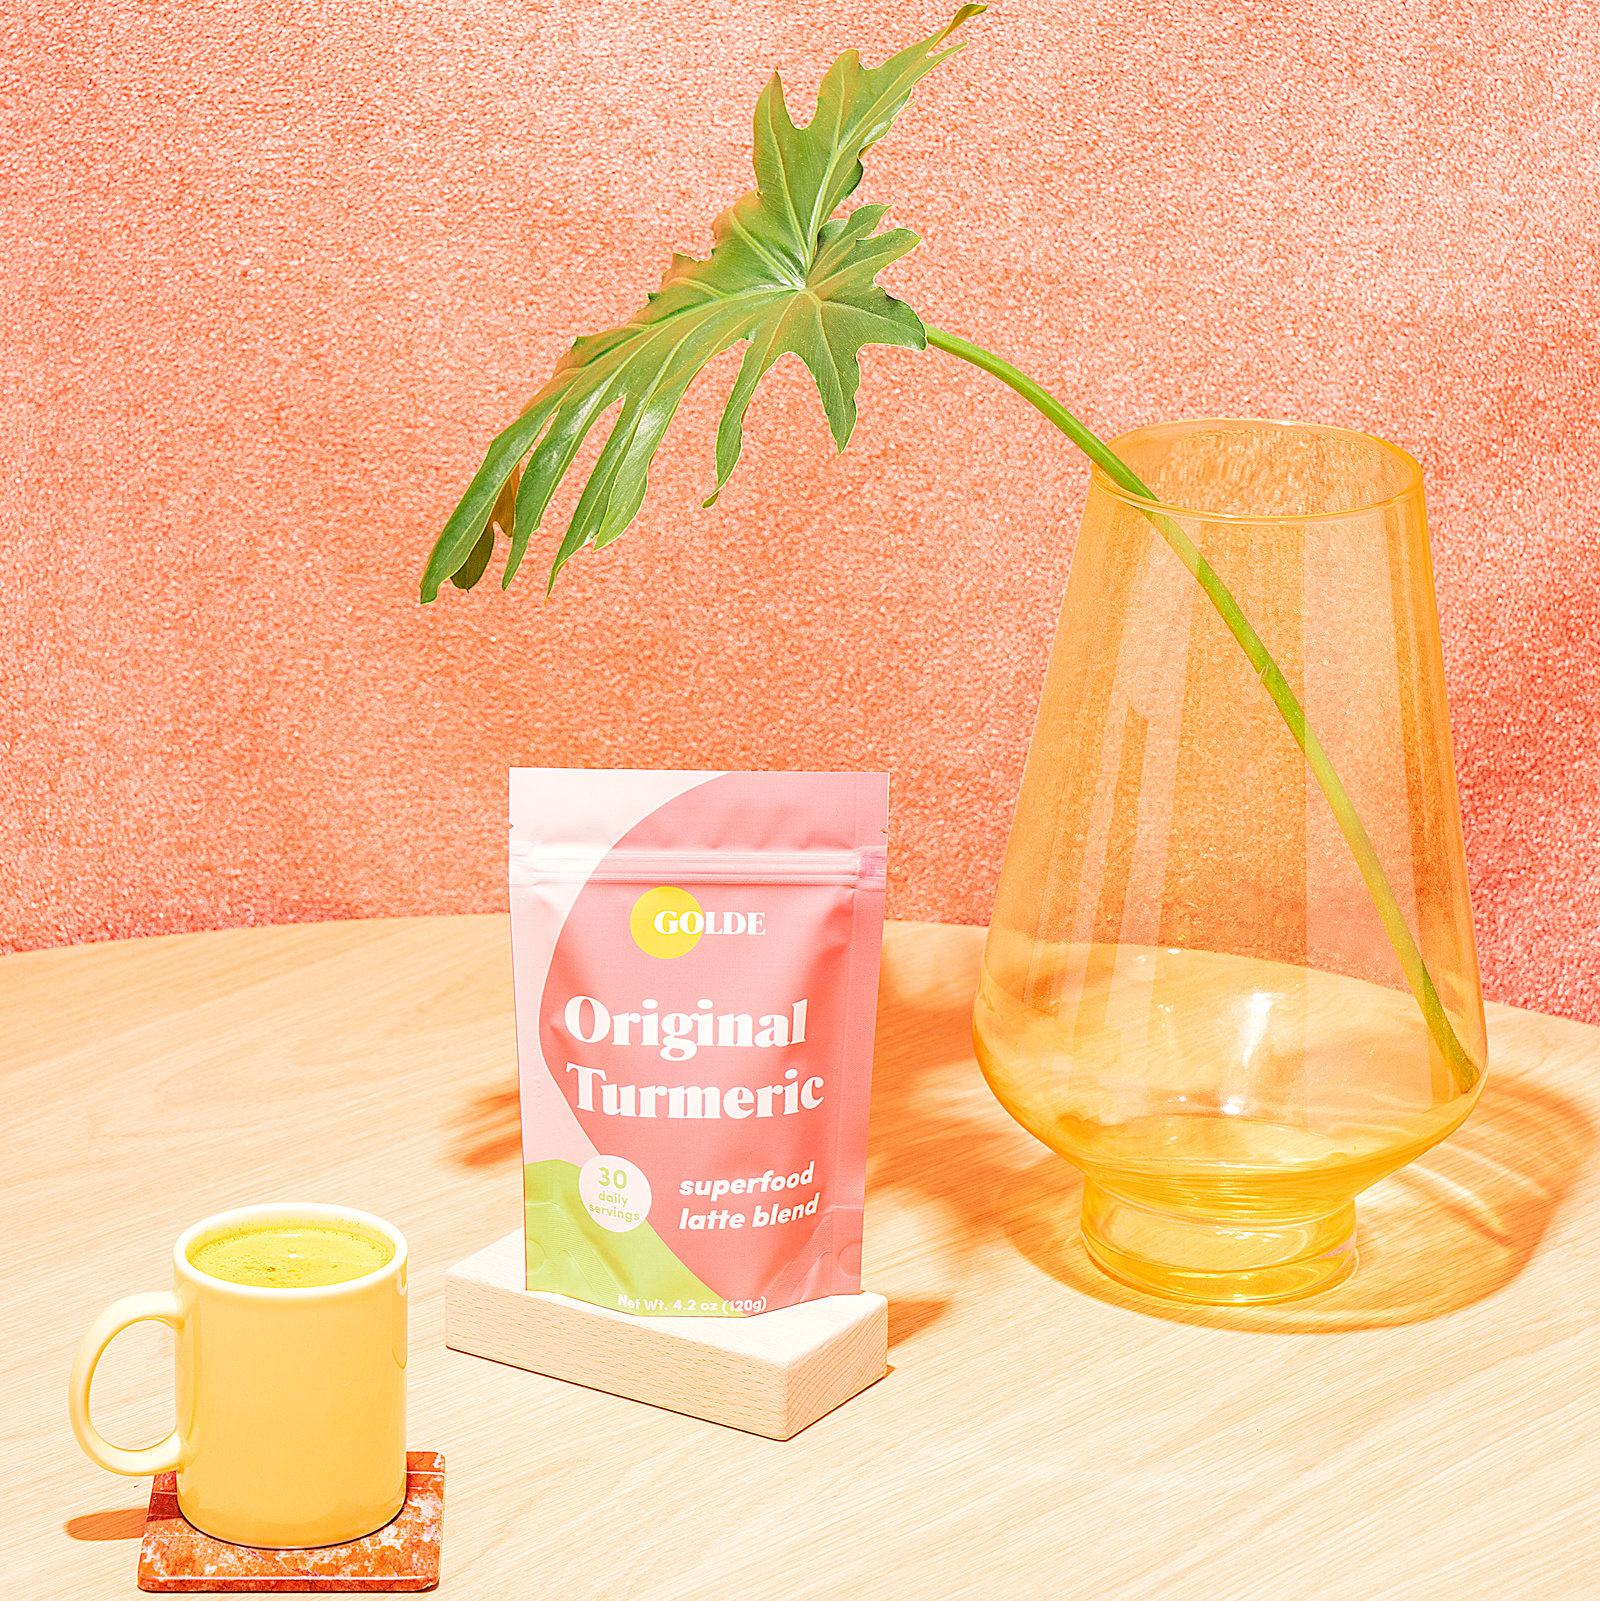 Alternate product image for Original Turmeric Latte Blend shown with the description.